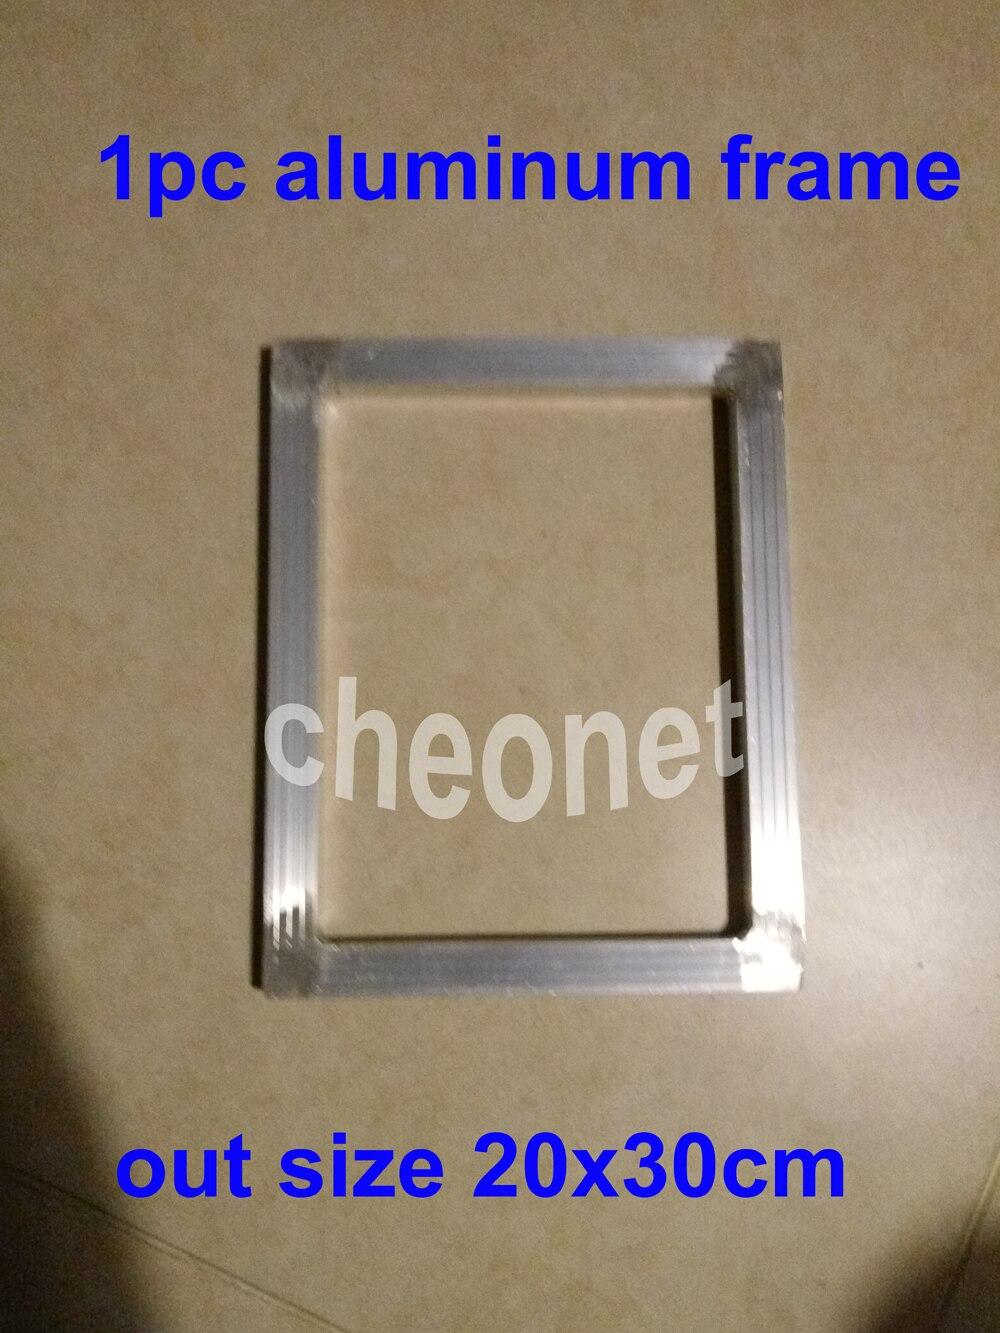 Murah 1 Pc Luar Ukuran 20x30 Cm Sutra Sablon Aluminium Bingkai Di Pin Thailand 12mm